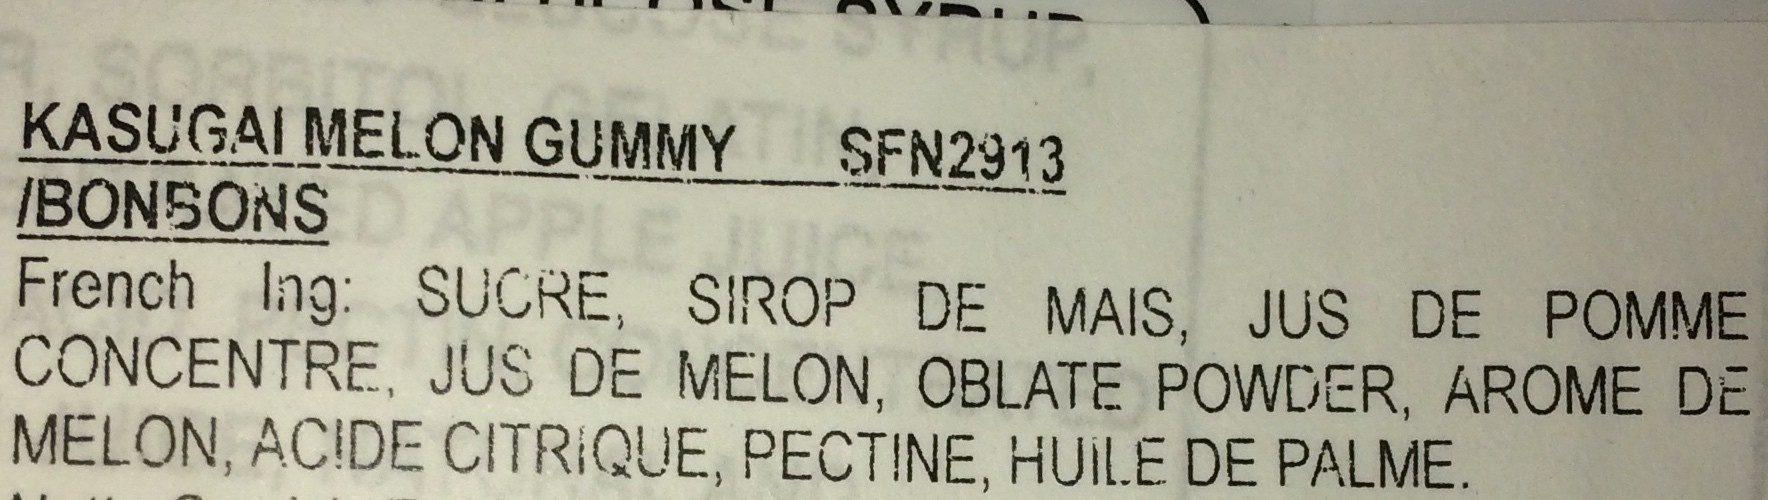 Melon Gummy Candy - Ingredients